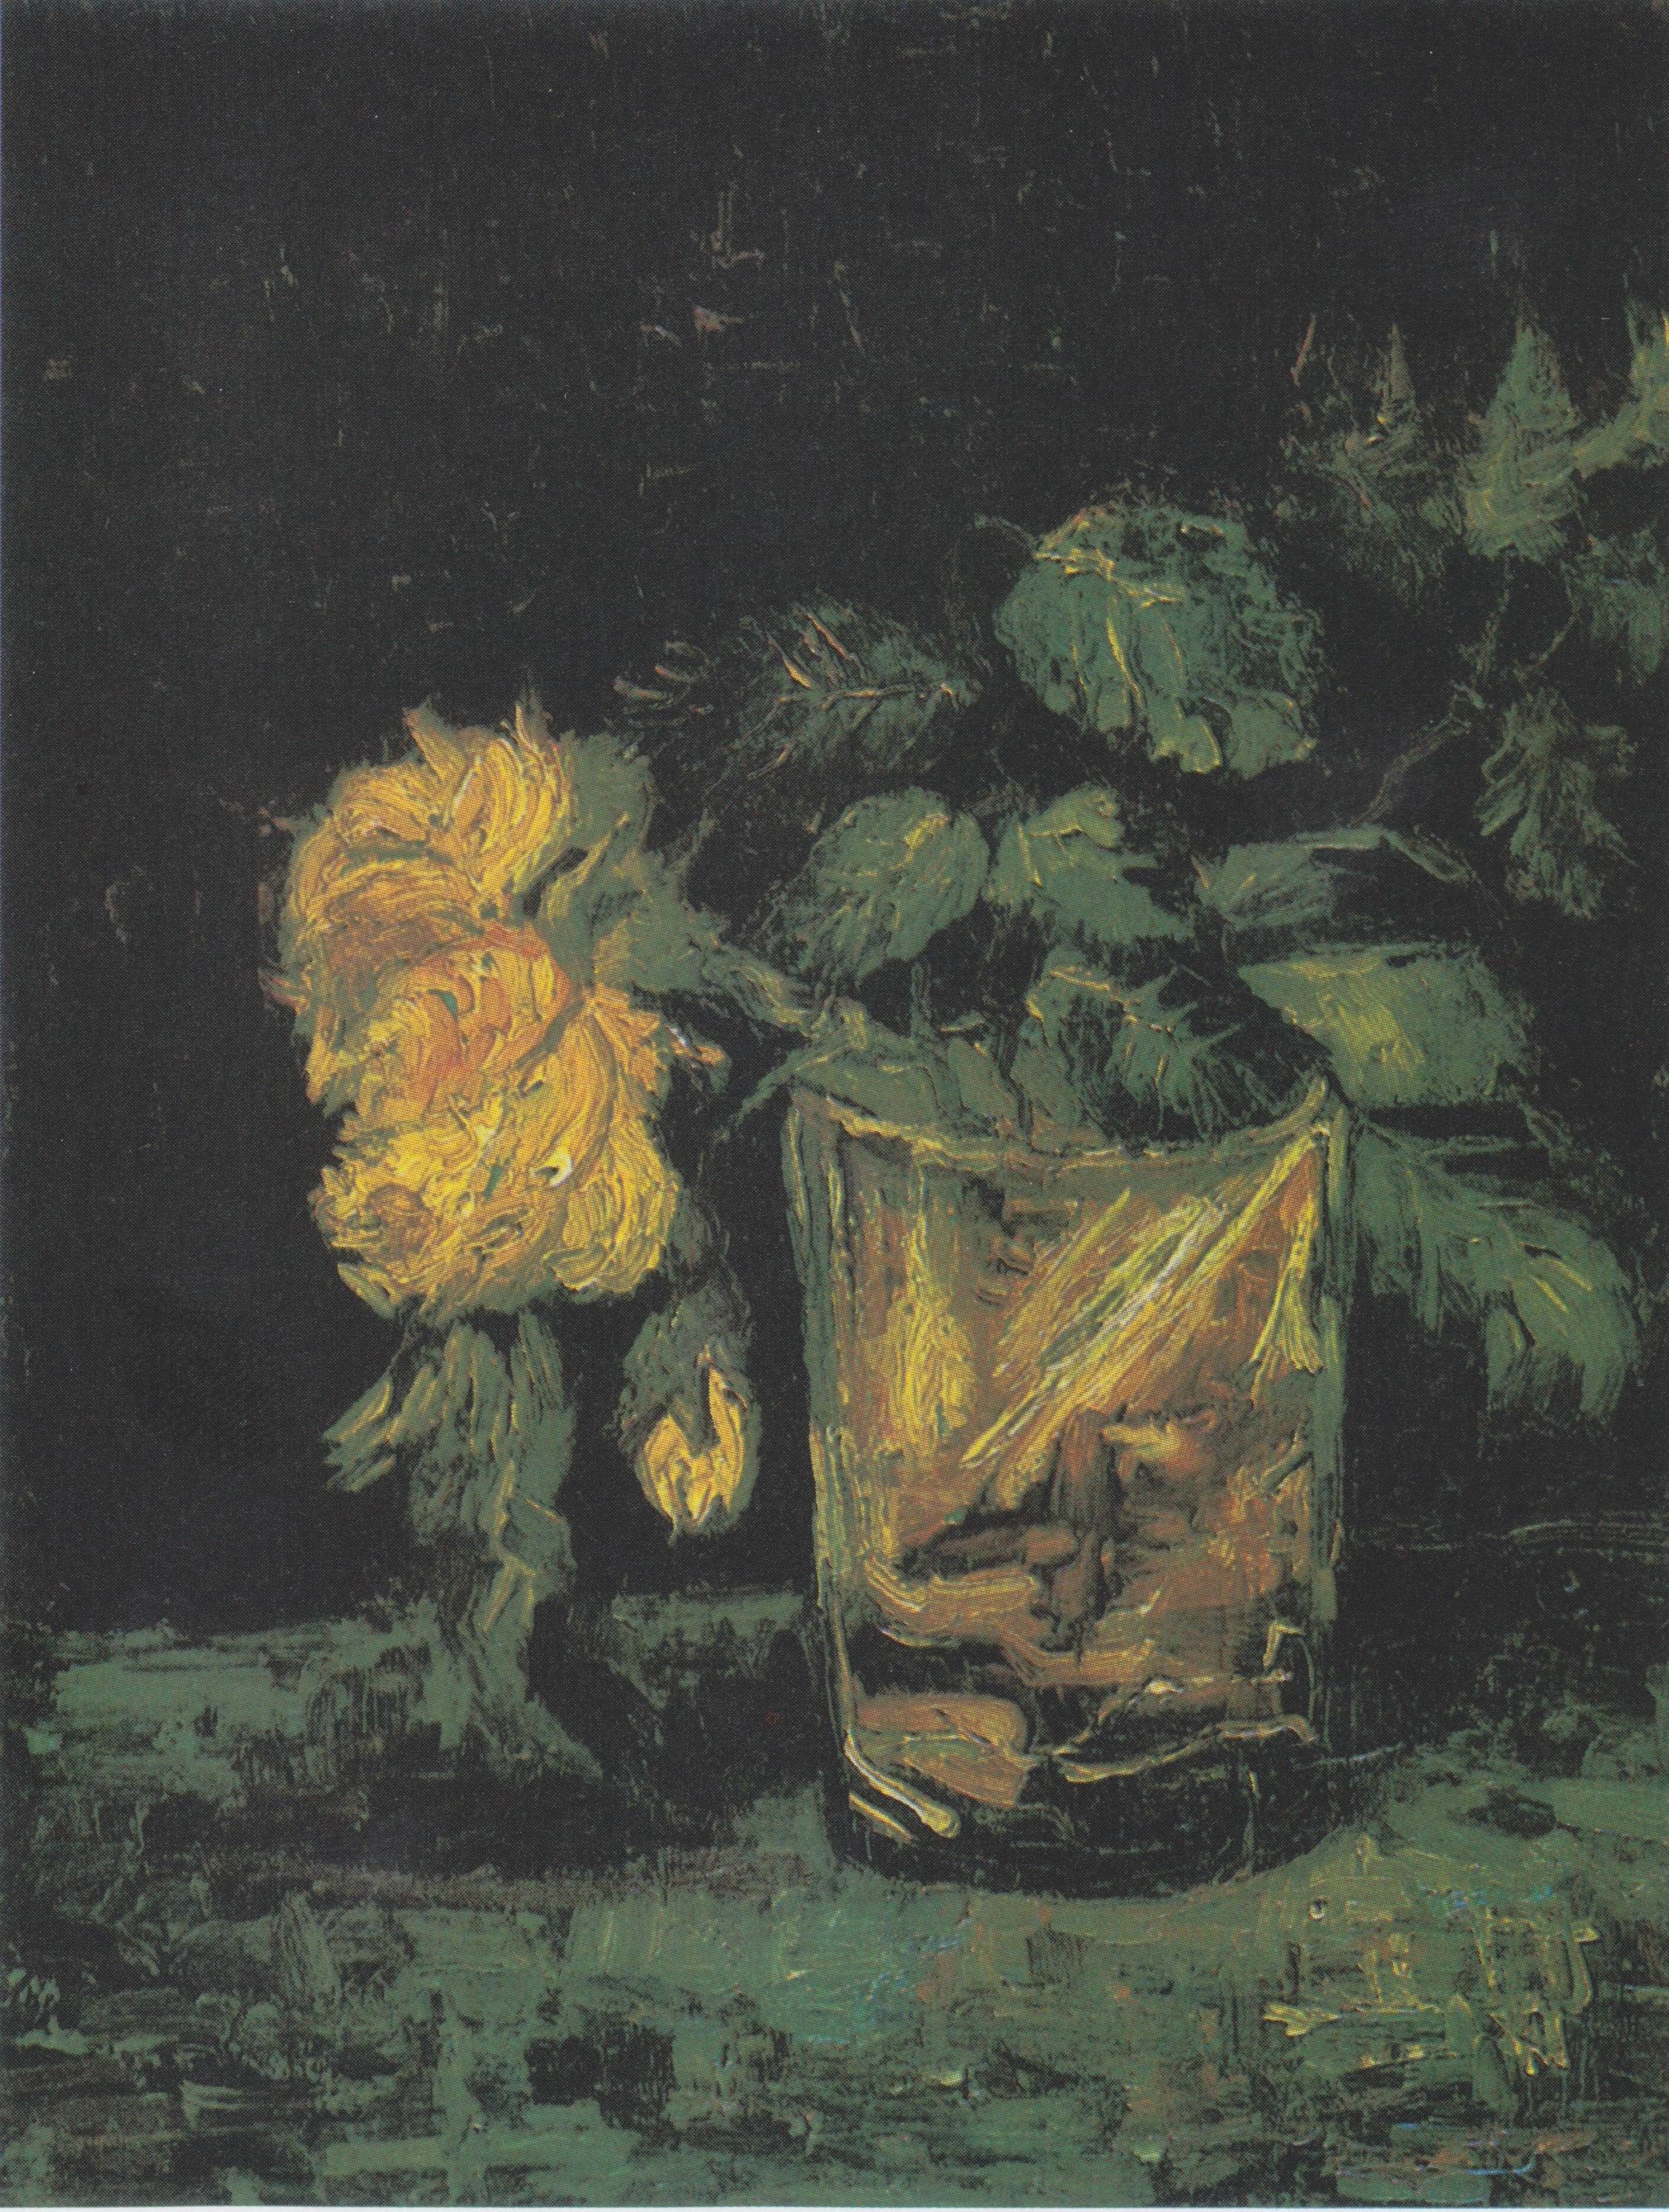 Ван Гог картина натюрморт стакан пейзажи природы художник Альберт Сафиуллин